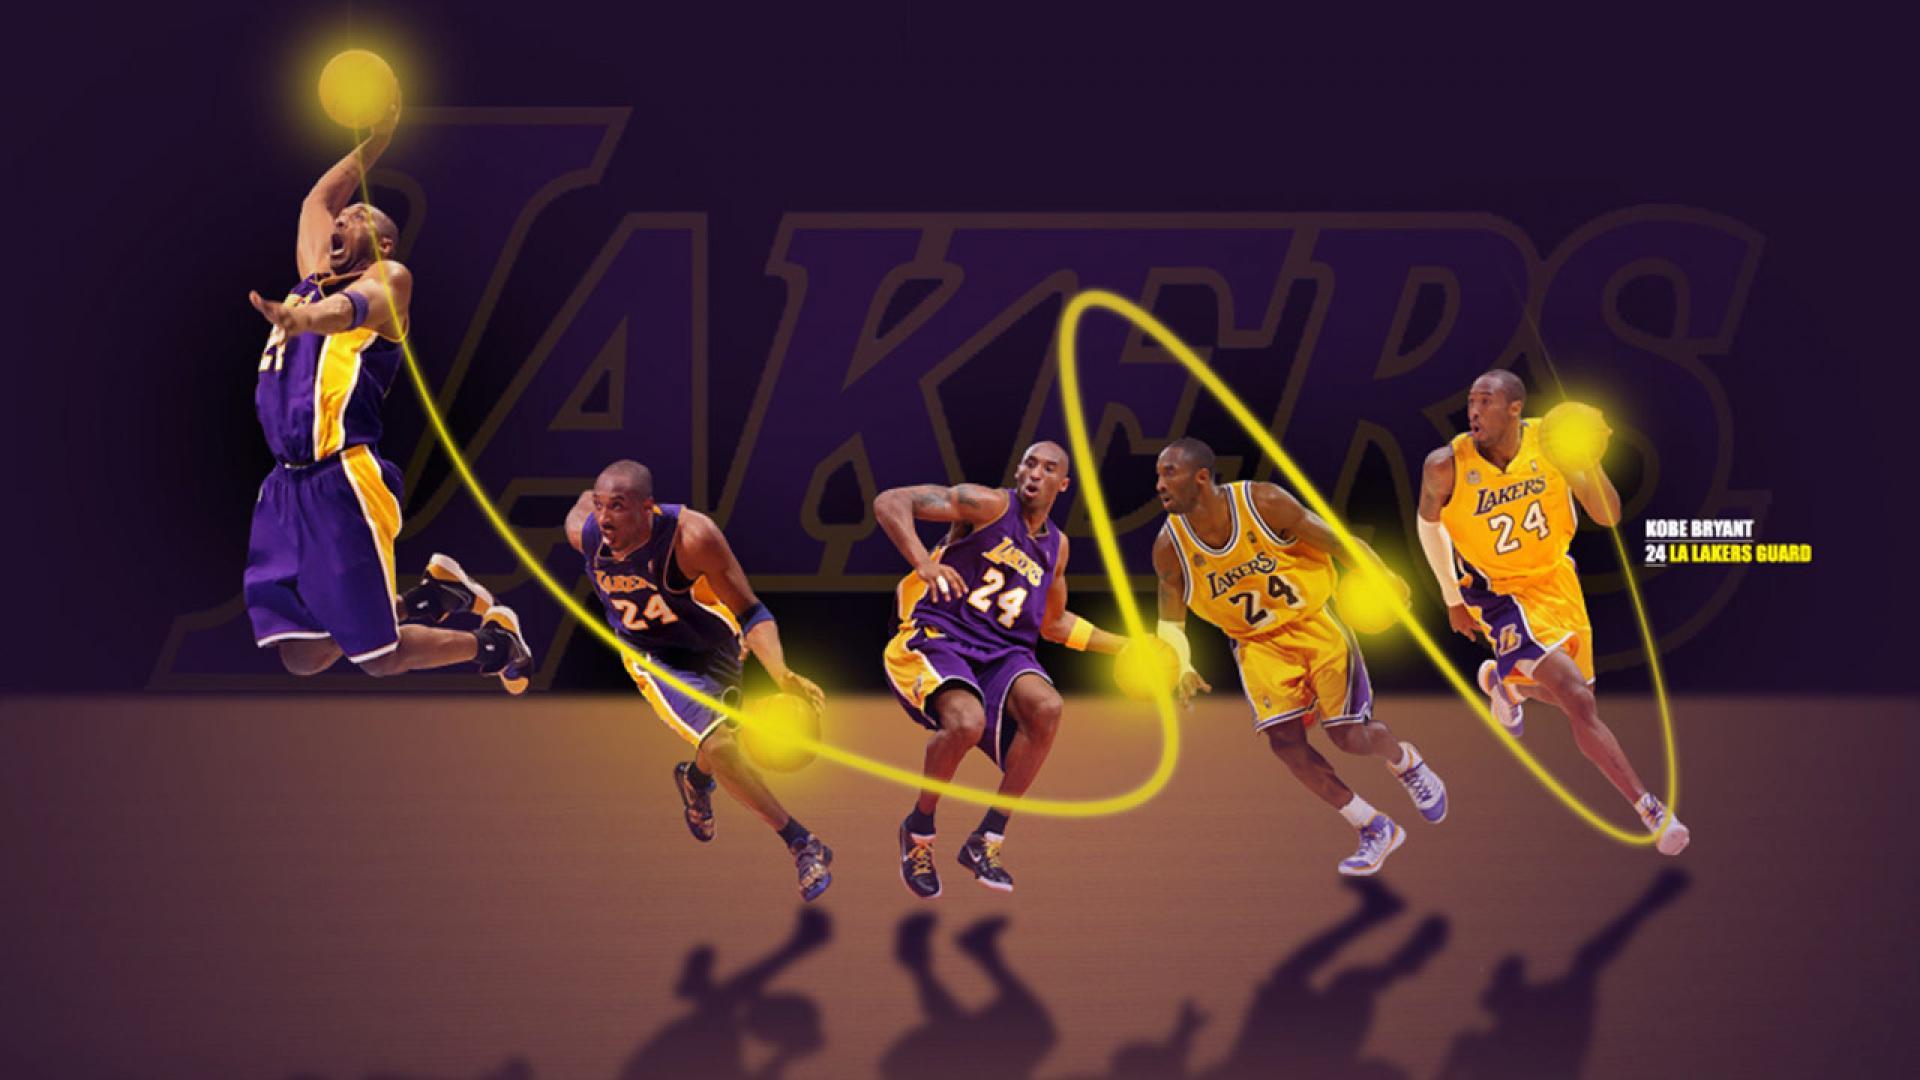 Kobe Bryant Wallpaper Dunk - HD Wallpaper